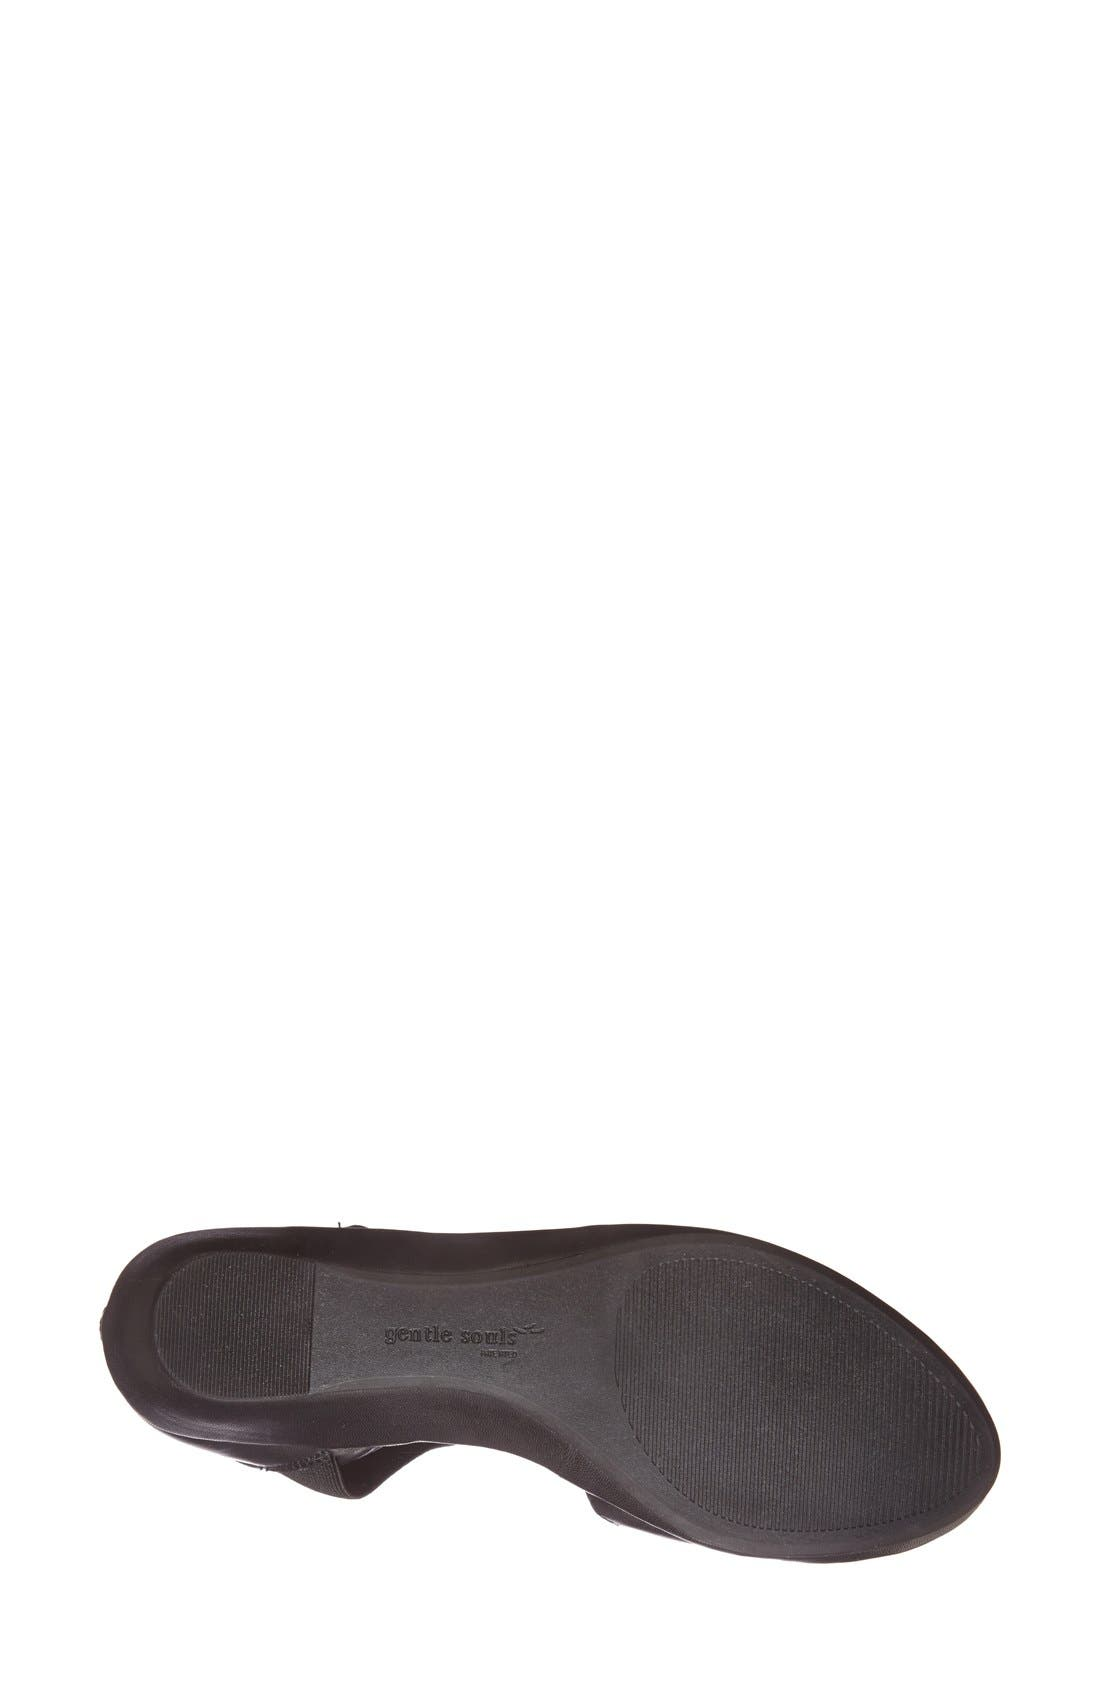 GENTLE SOULS BY KENNETH COLE, 'Noa' Elastic Strap d'Orsay Sandal, Alternate thumbnail 4, color, BLACK